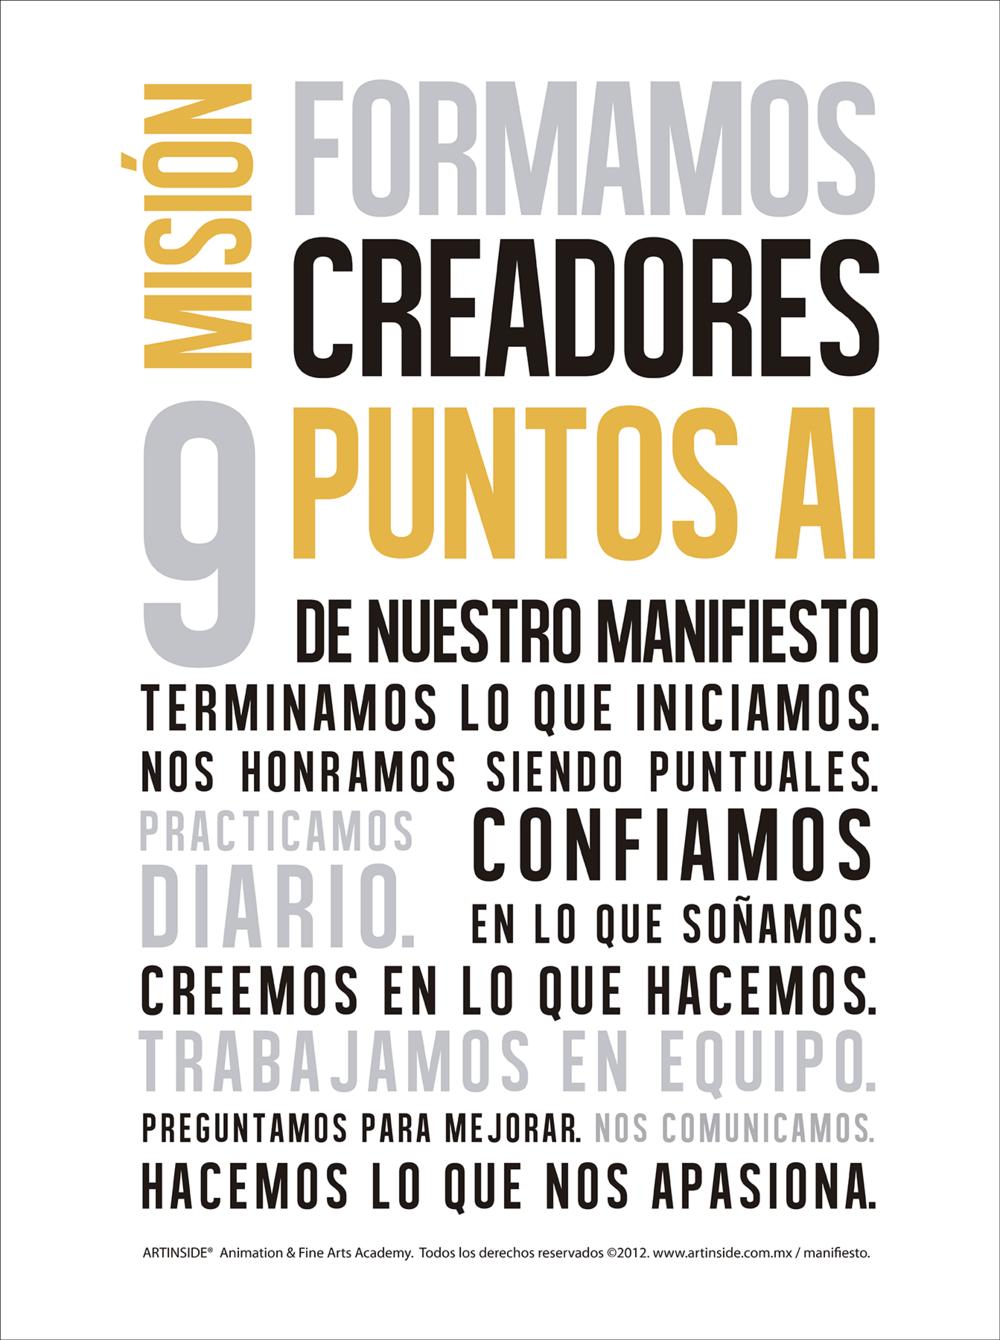 Manifiesto_Artinside.png